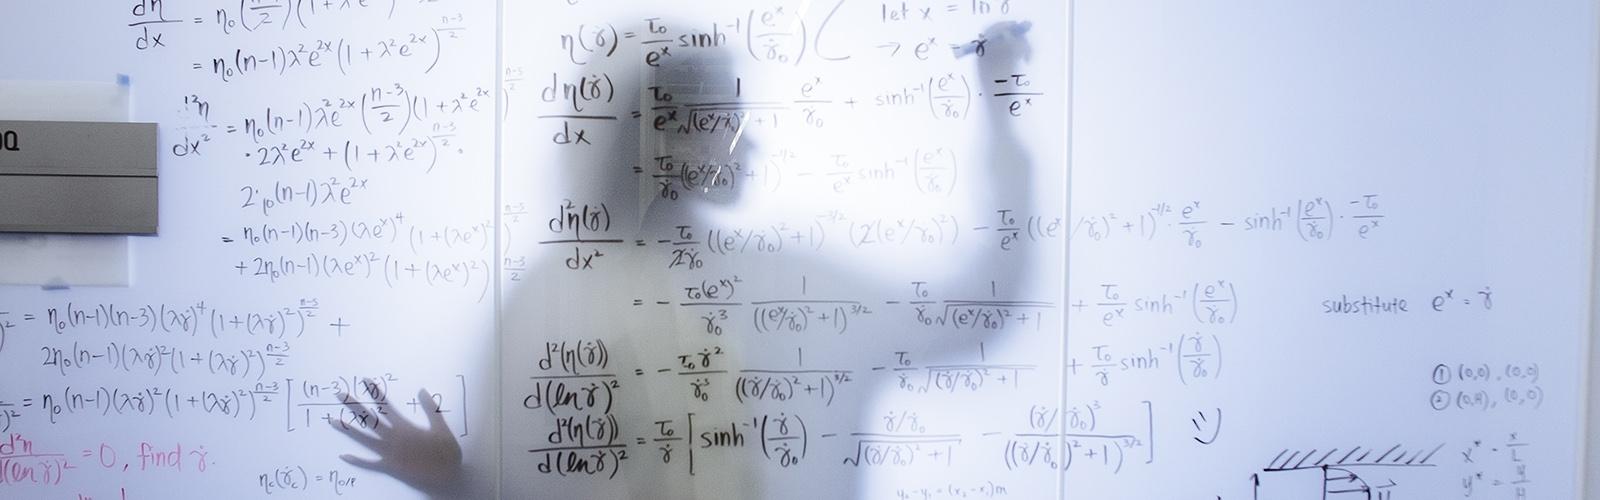 Whiteboard equation